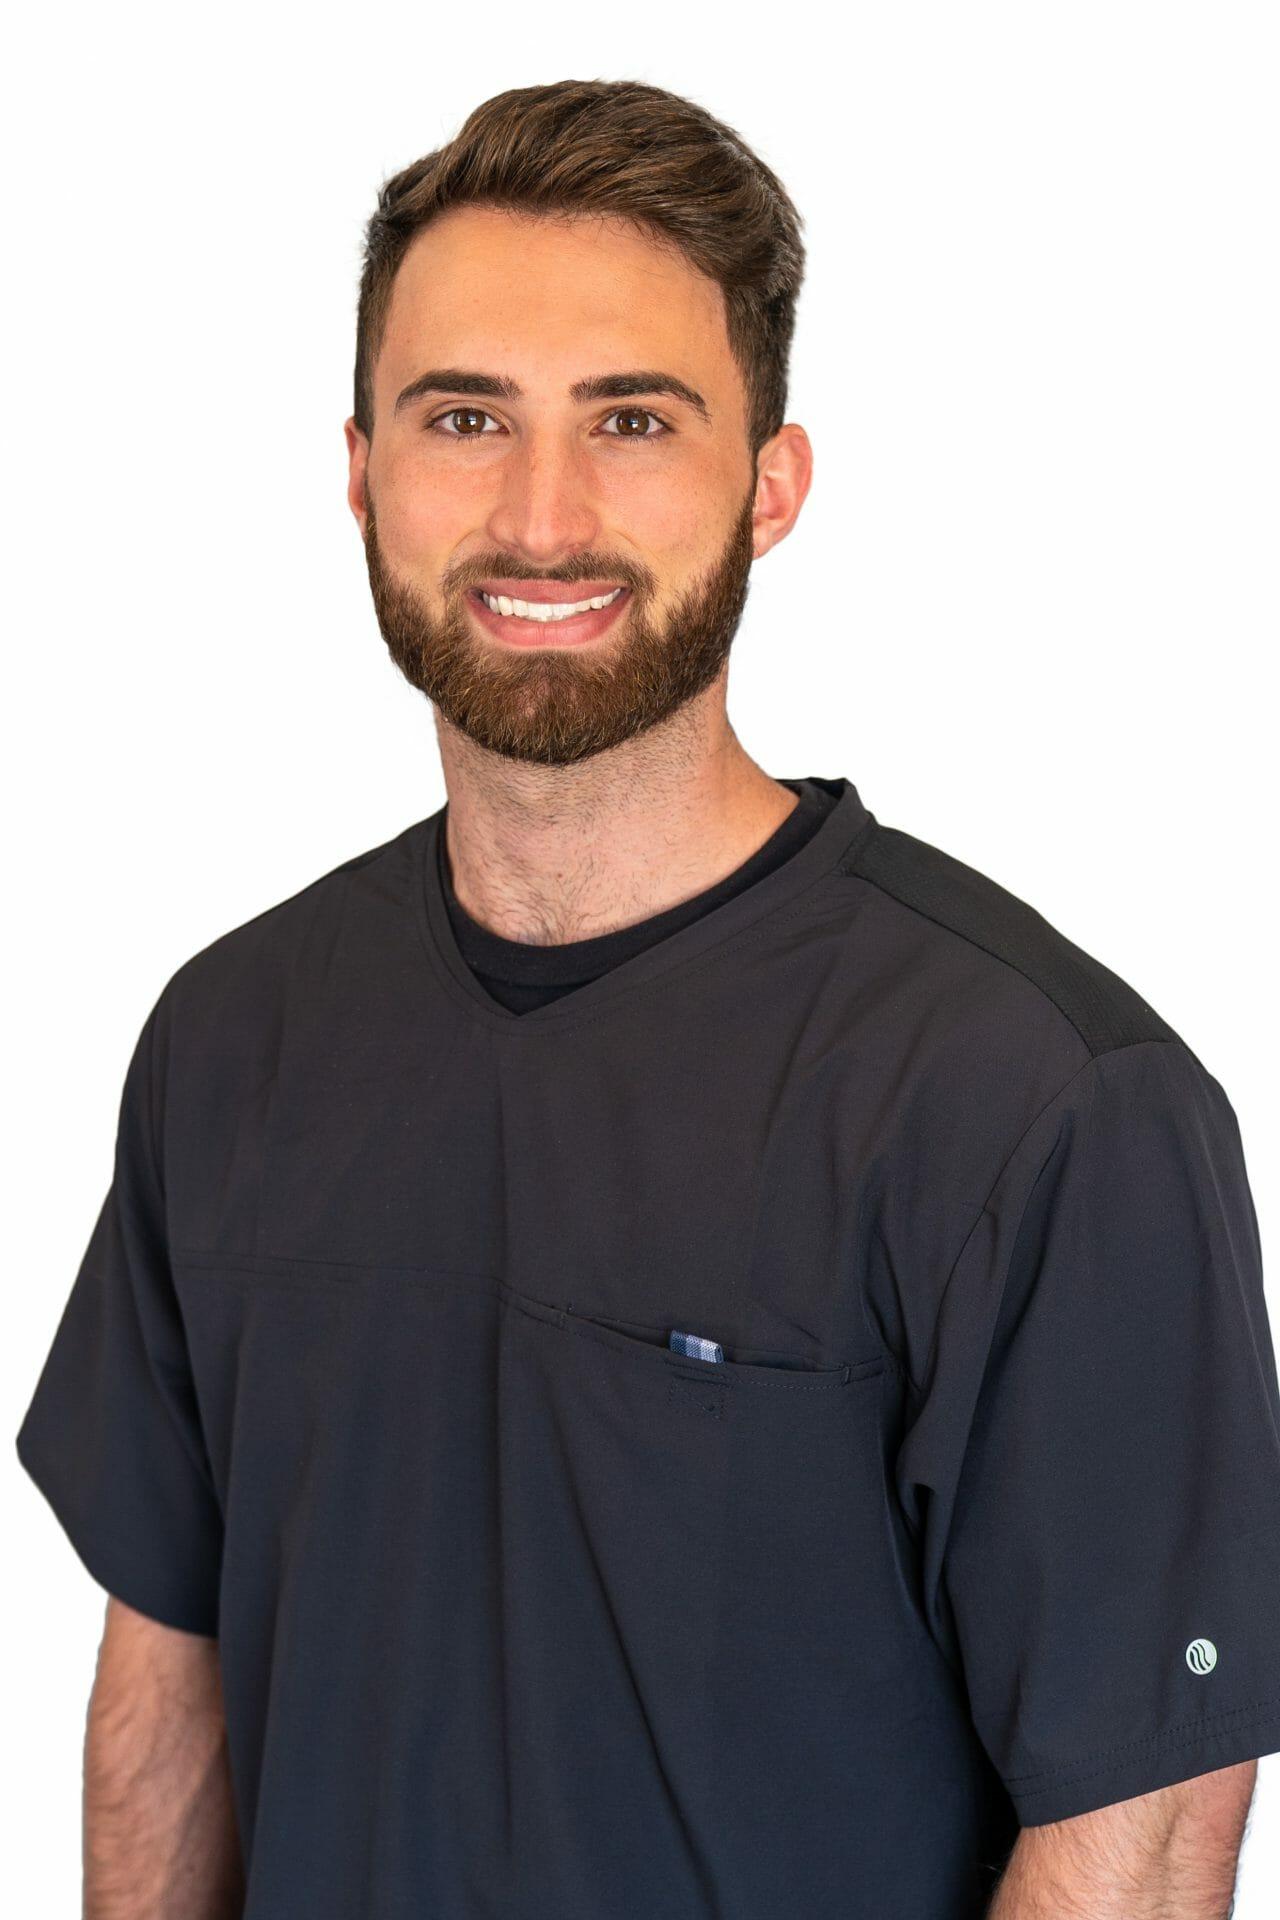 20190708 Hawkins Dentistry 259 Edit - Landon